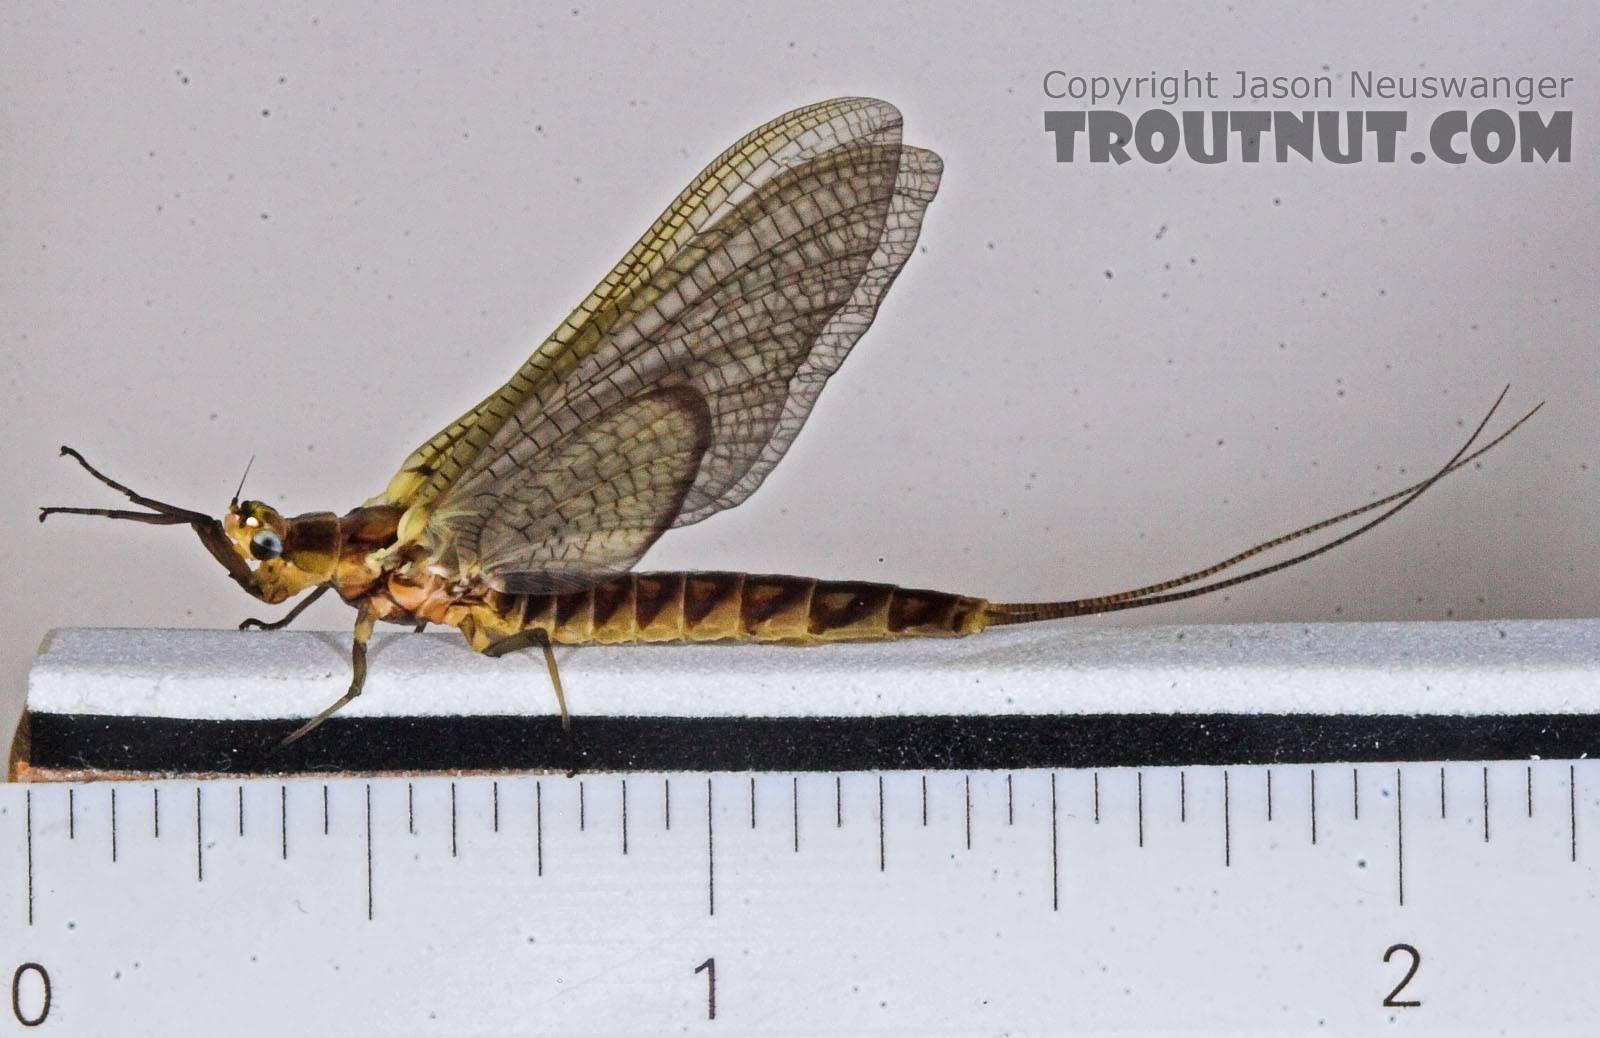 Female Hexagenia limbata (Hex) Mayfly Dun from the Namekagon River in Wisconsin